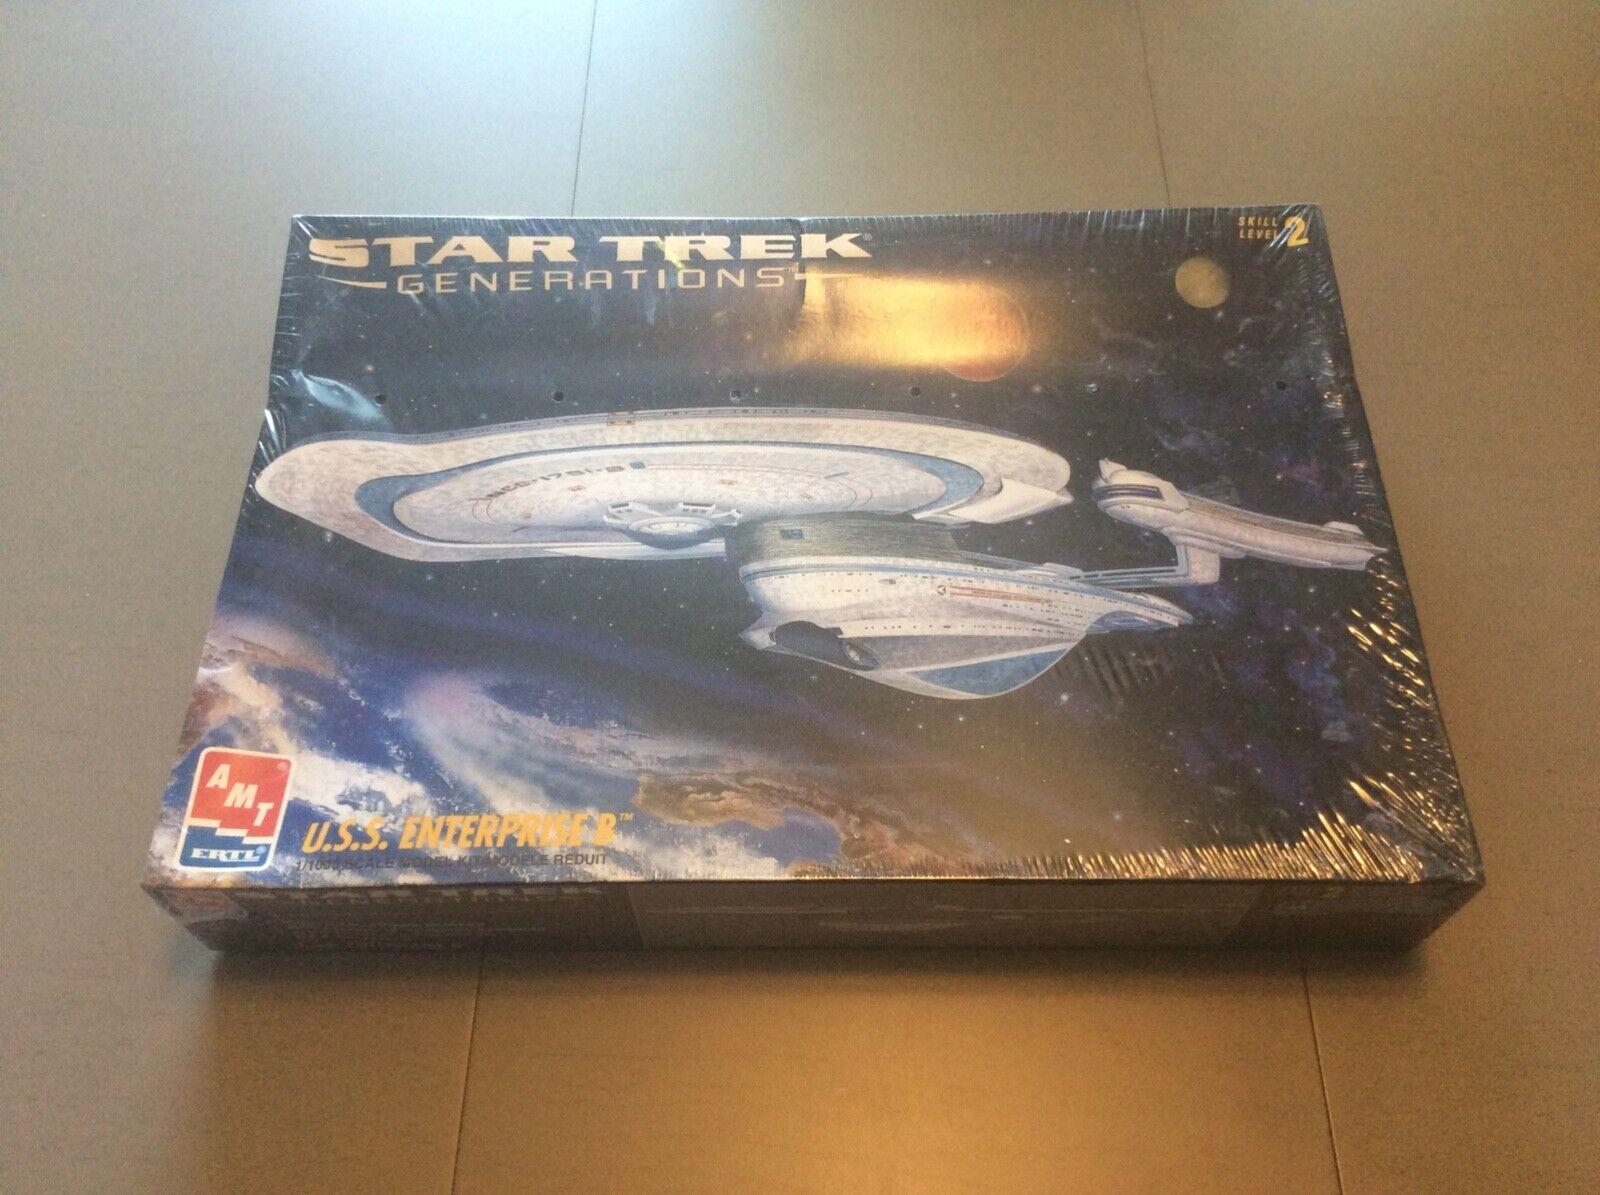 Estrella Trek Generation - American Enterprise B Plastics Plastics Plastics Model Kit.Importe 8762   1  1000 nuevos 198